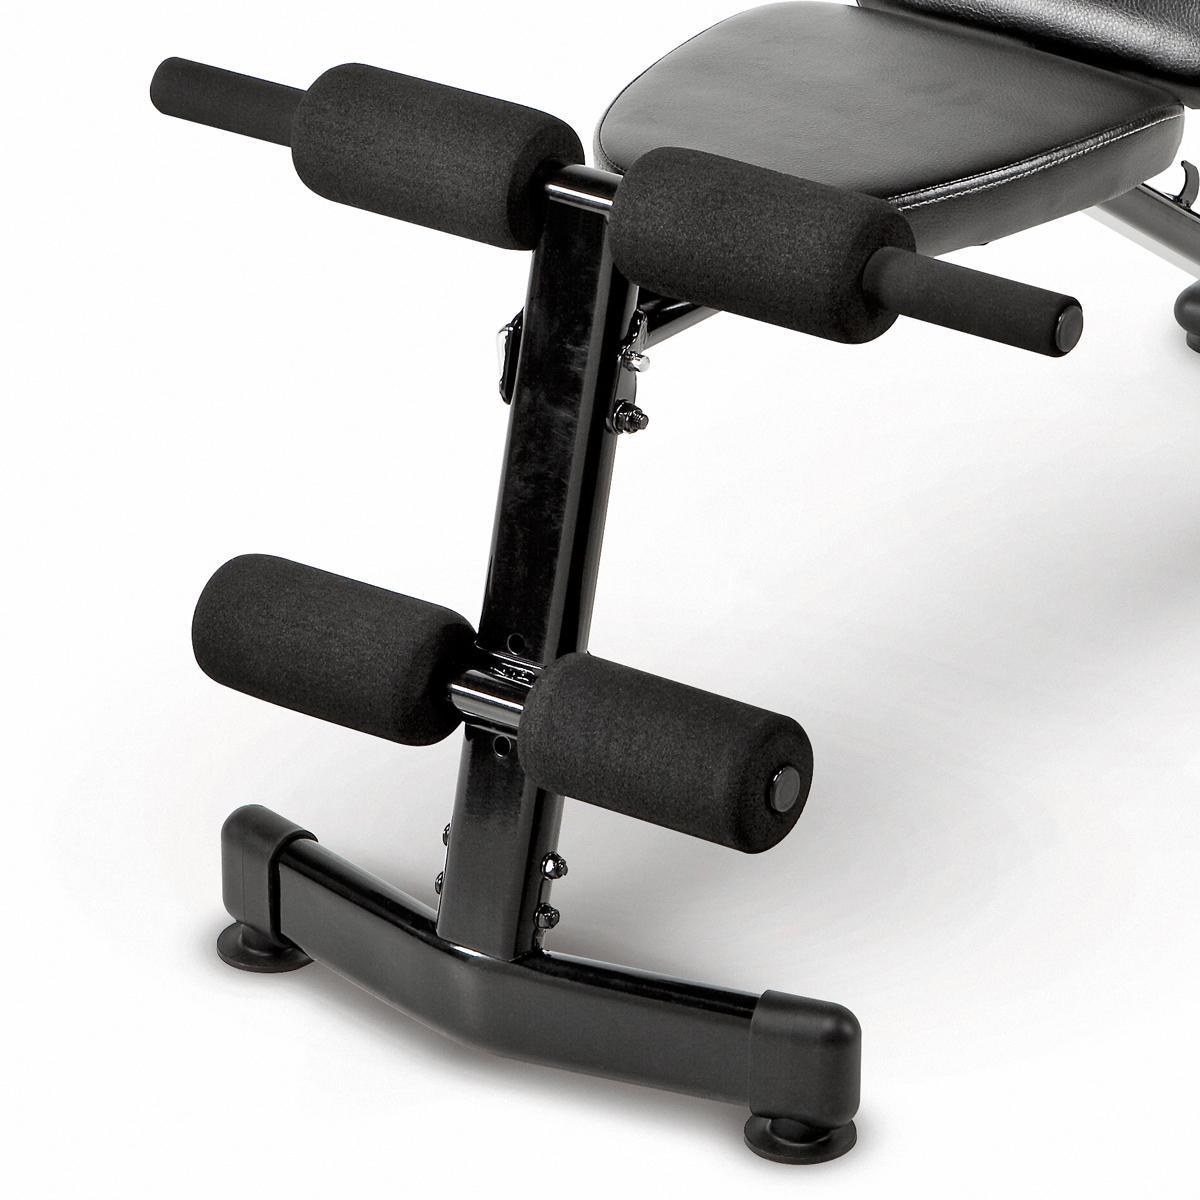 Multi Purpose Workout Bench 28 Images Amazon Com Marcy Multi Purpose Adjustble Utility Bench